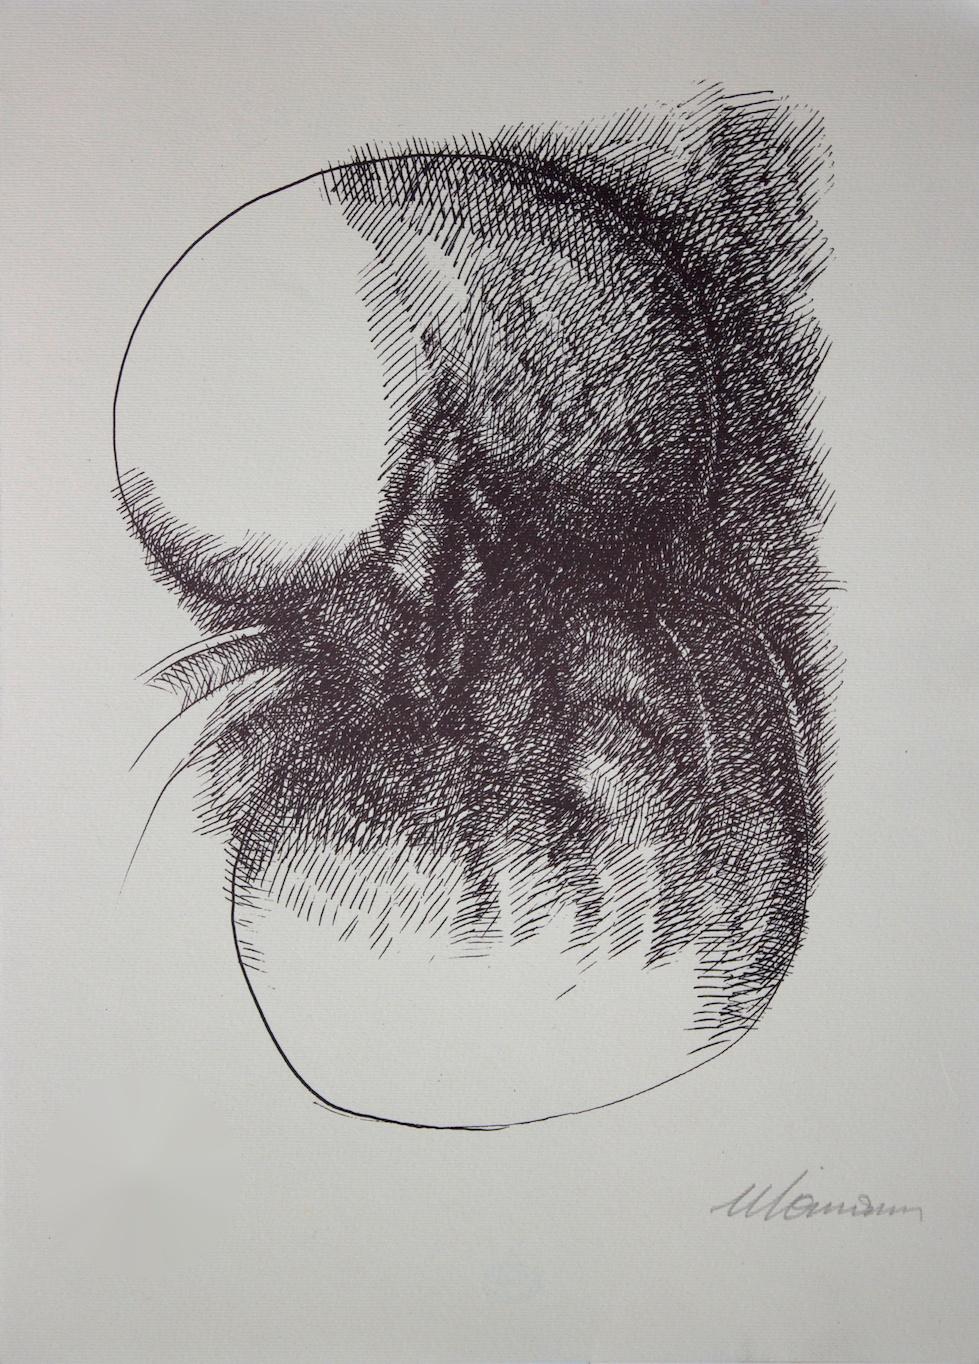 Cellule (Cells) - incisione su carta (engraving on paper) - 1971